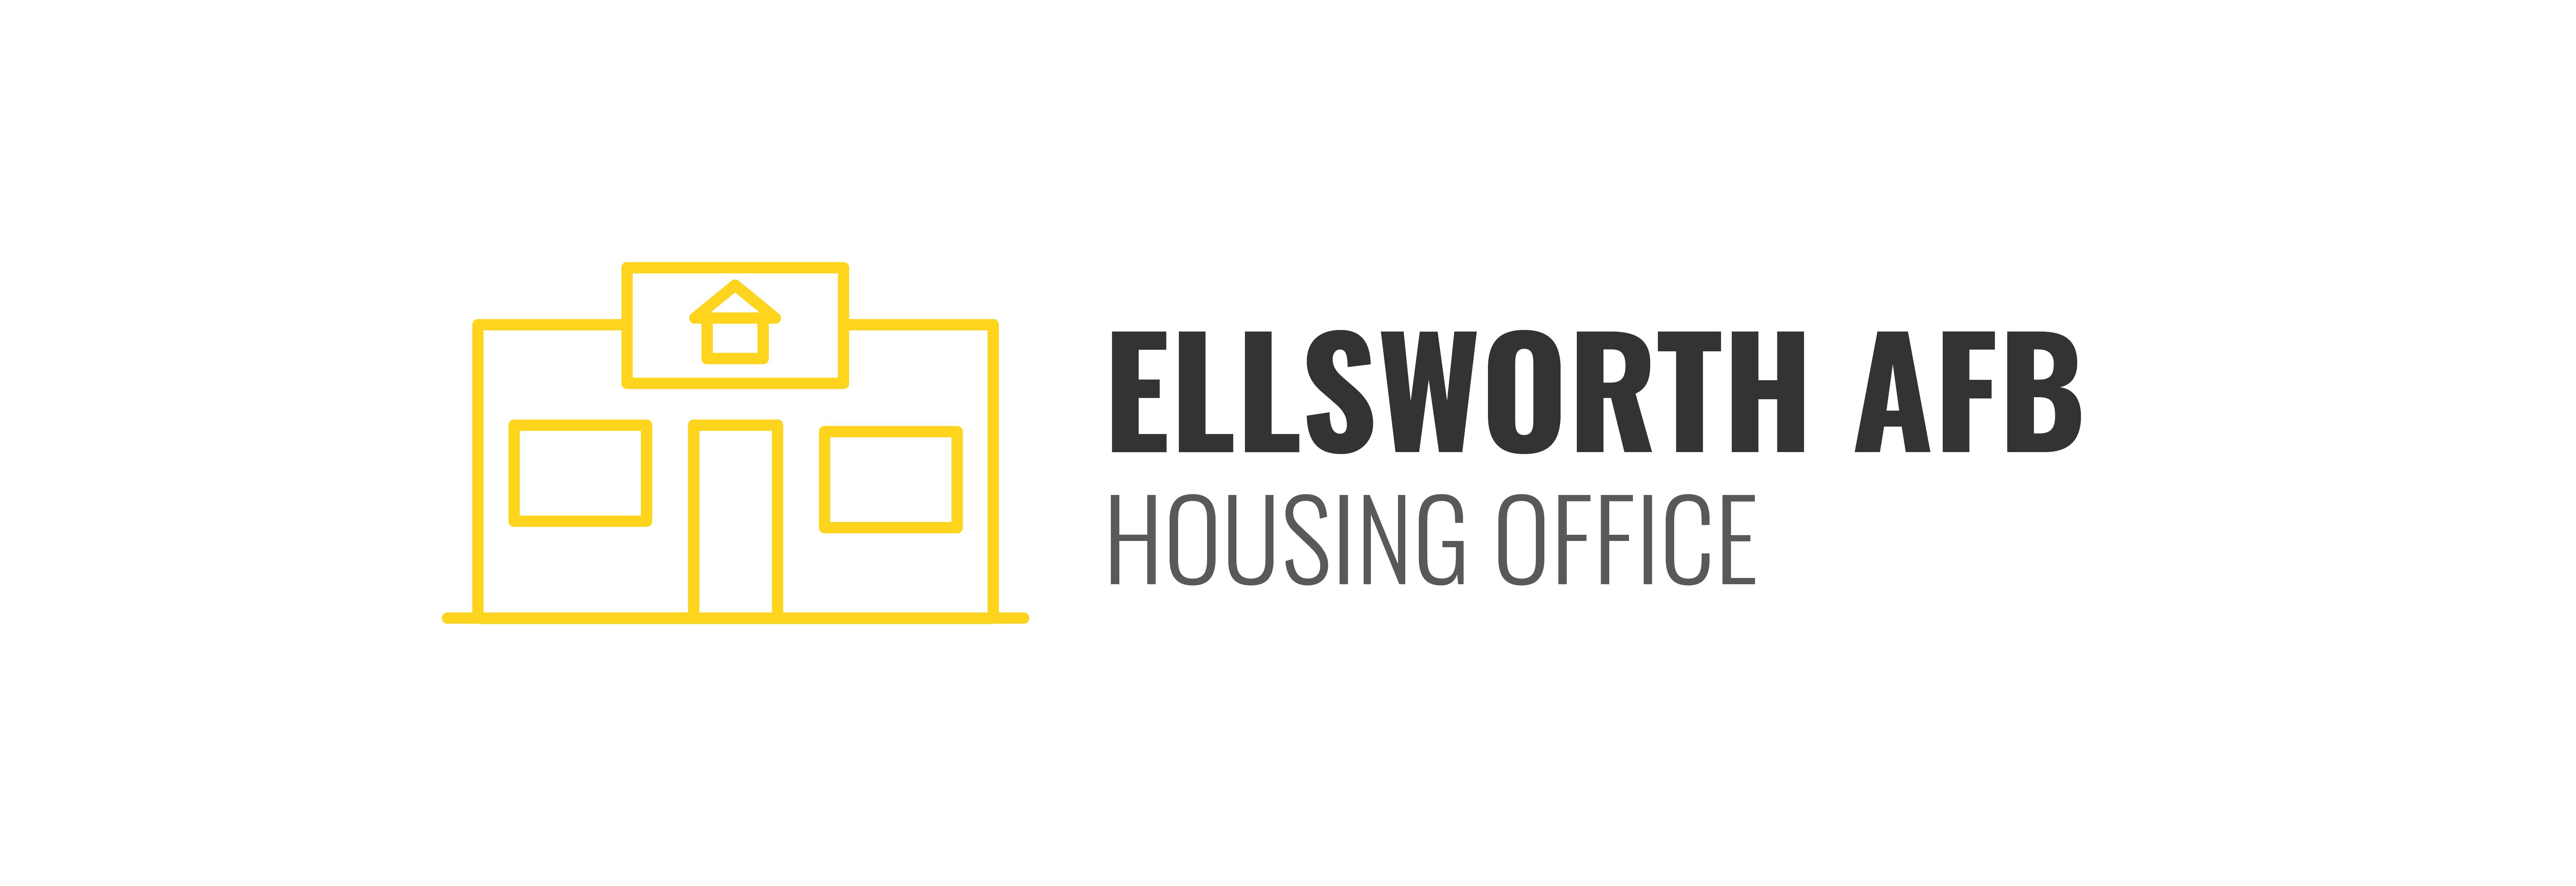 Ellsworth AFB Housing Office